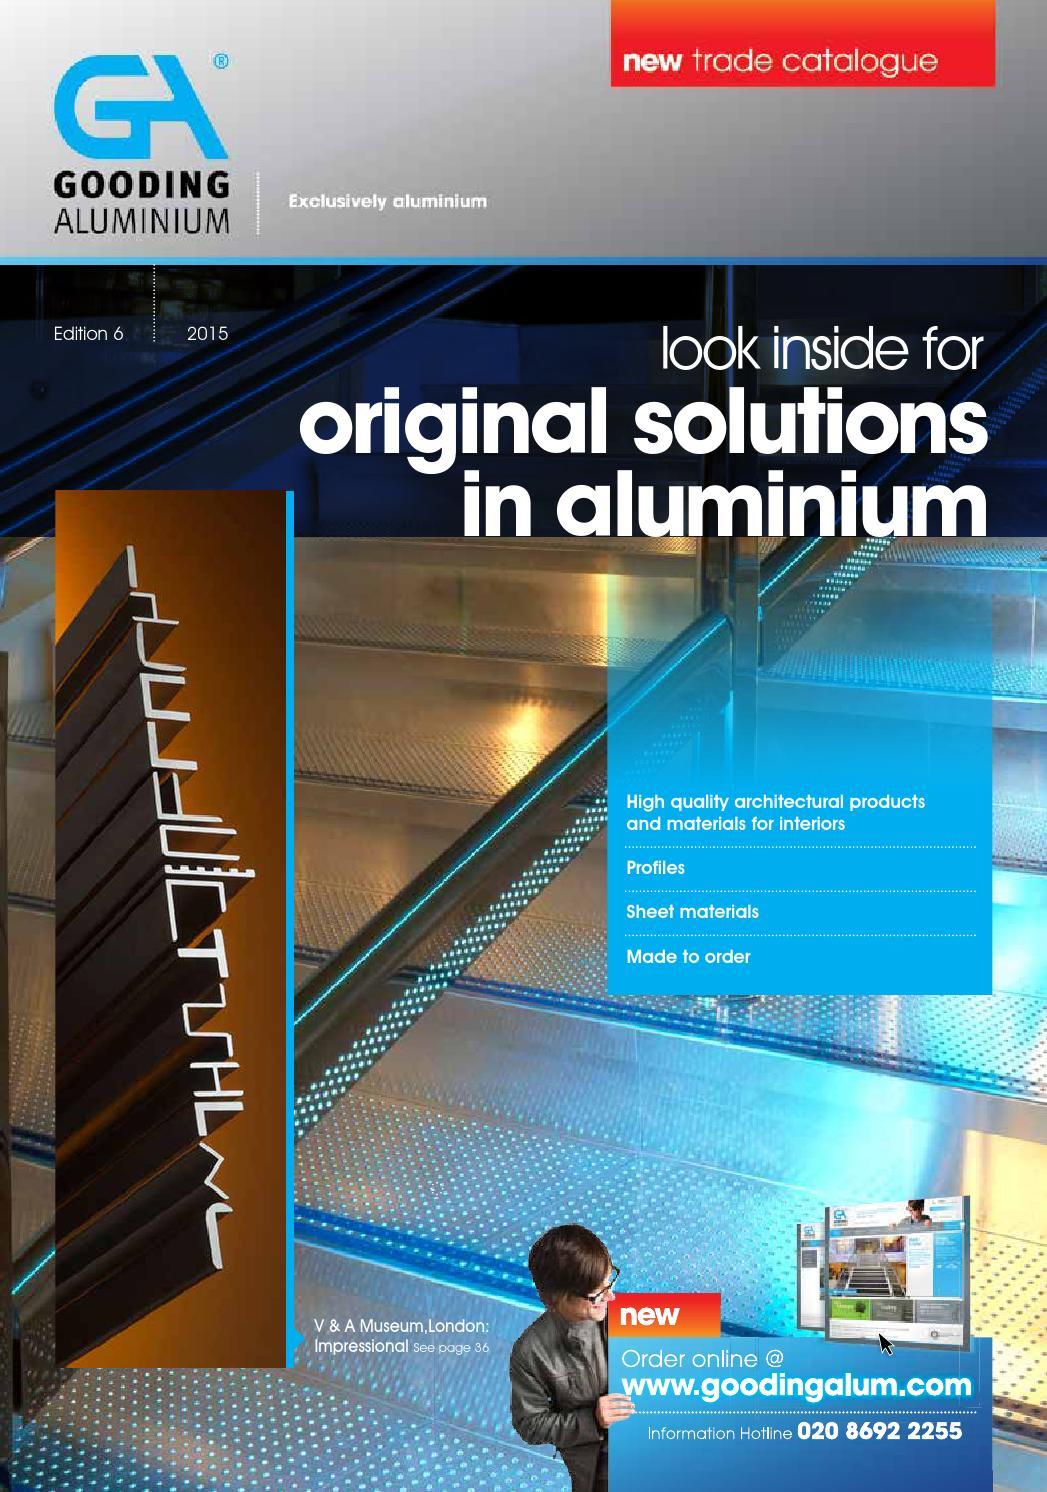 2.5mm Aluminium Sheet 1050 H14 Grade Various Sizes With Protective Coat 100 x 100mm